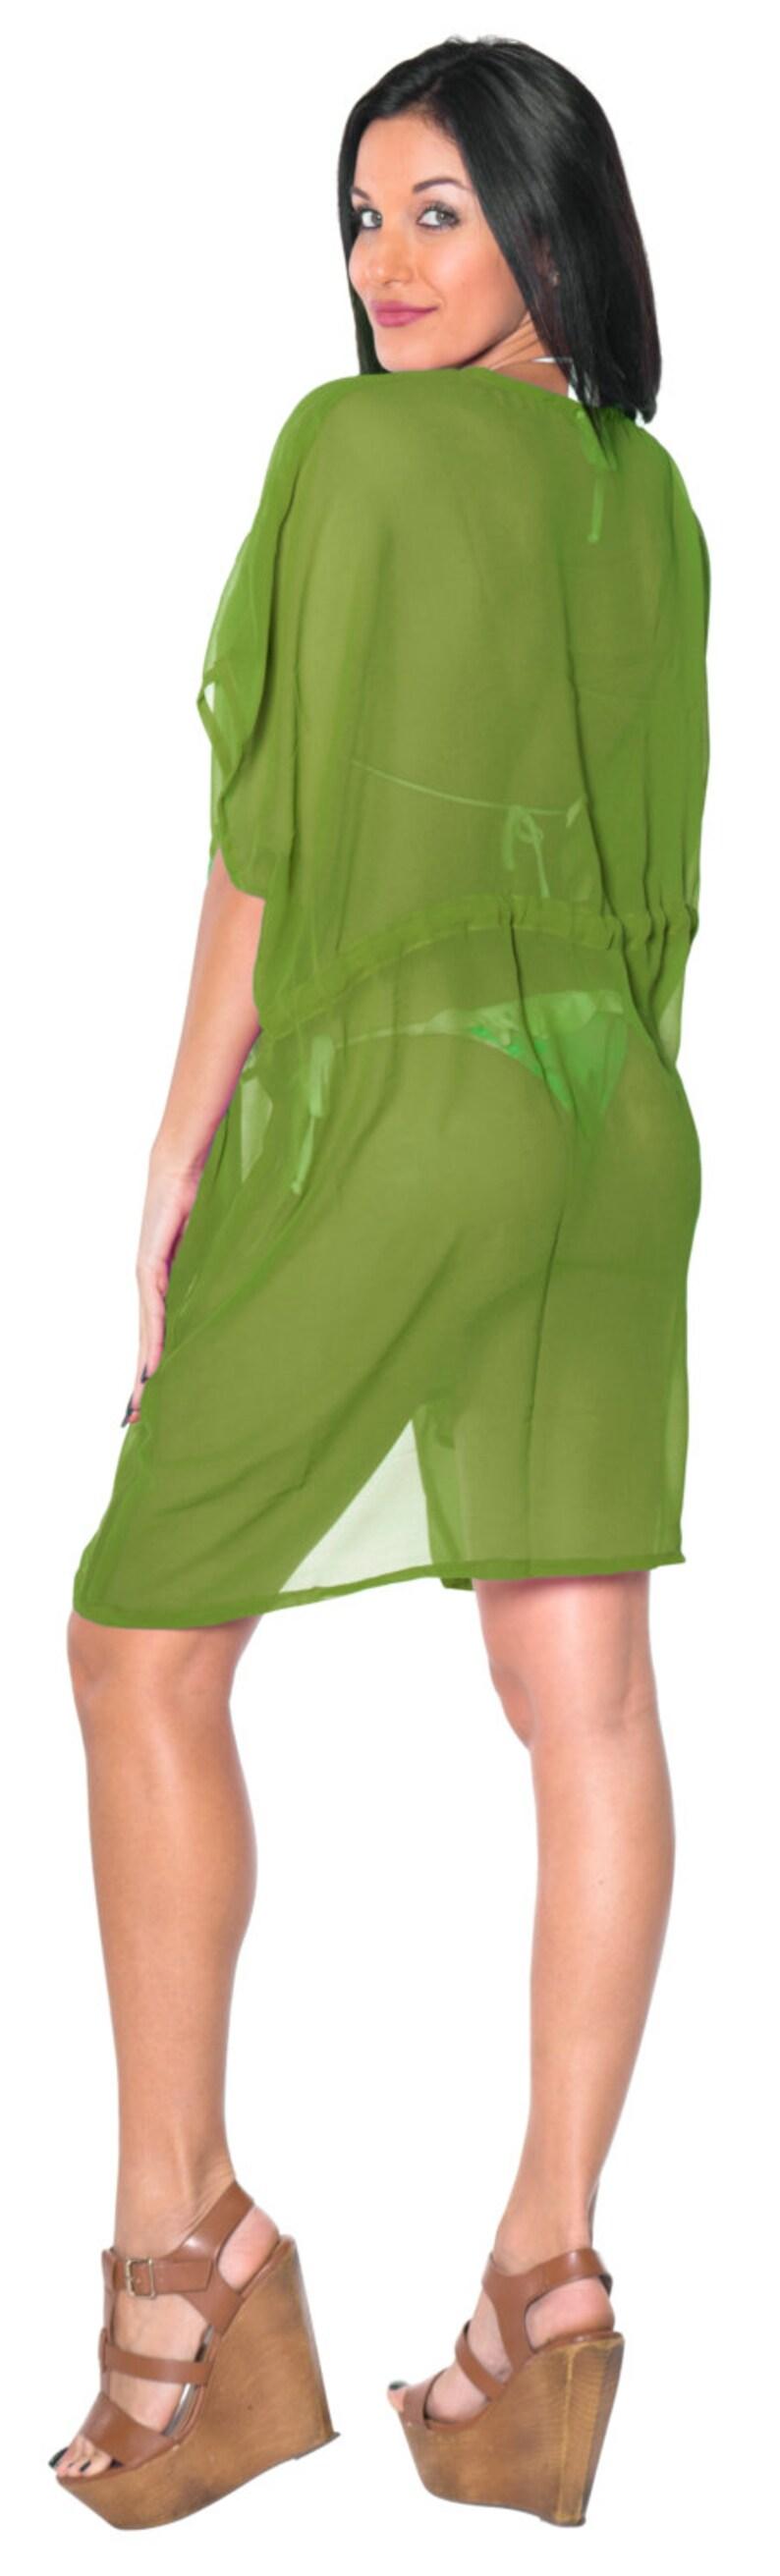 119626 La Leela Chiffon Colorful Swimwear Beach  Cover up Caftan Kaftan Green Plus Size sheer Women Swimwsuit Dress